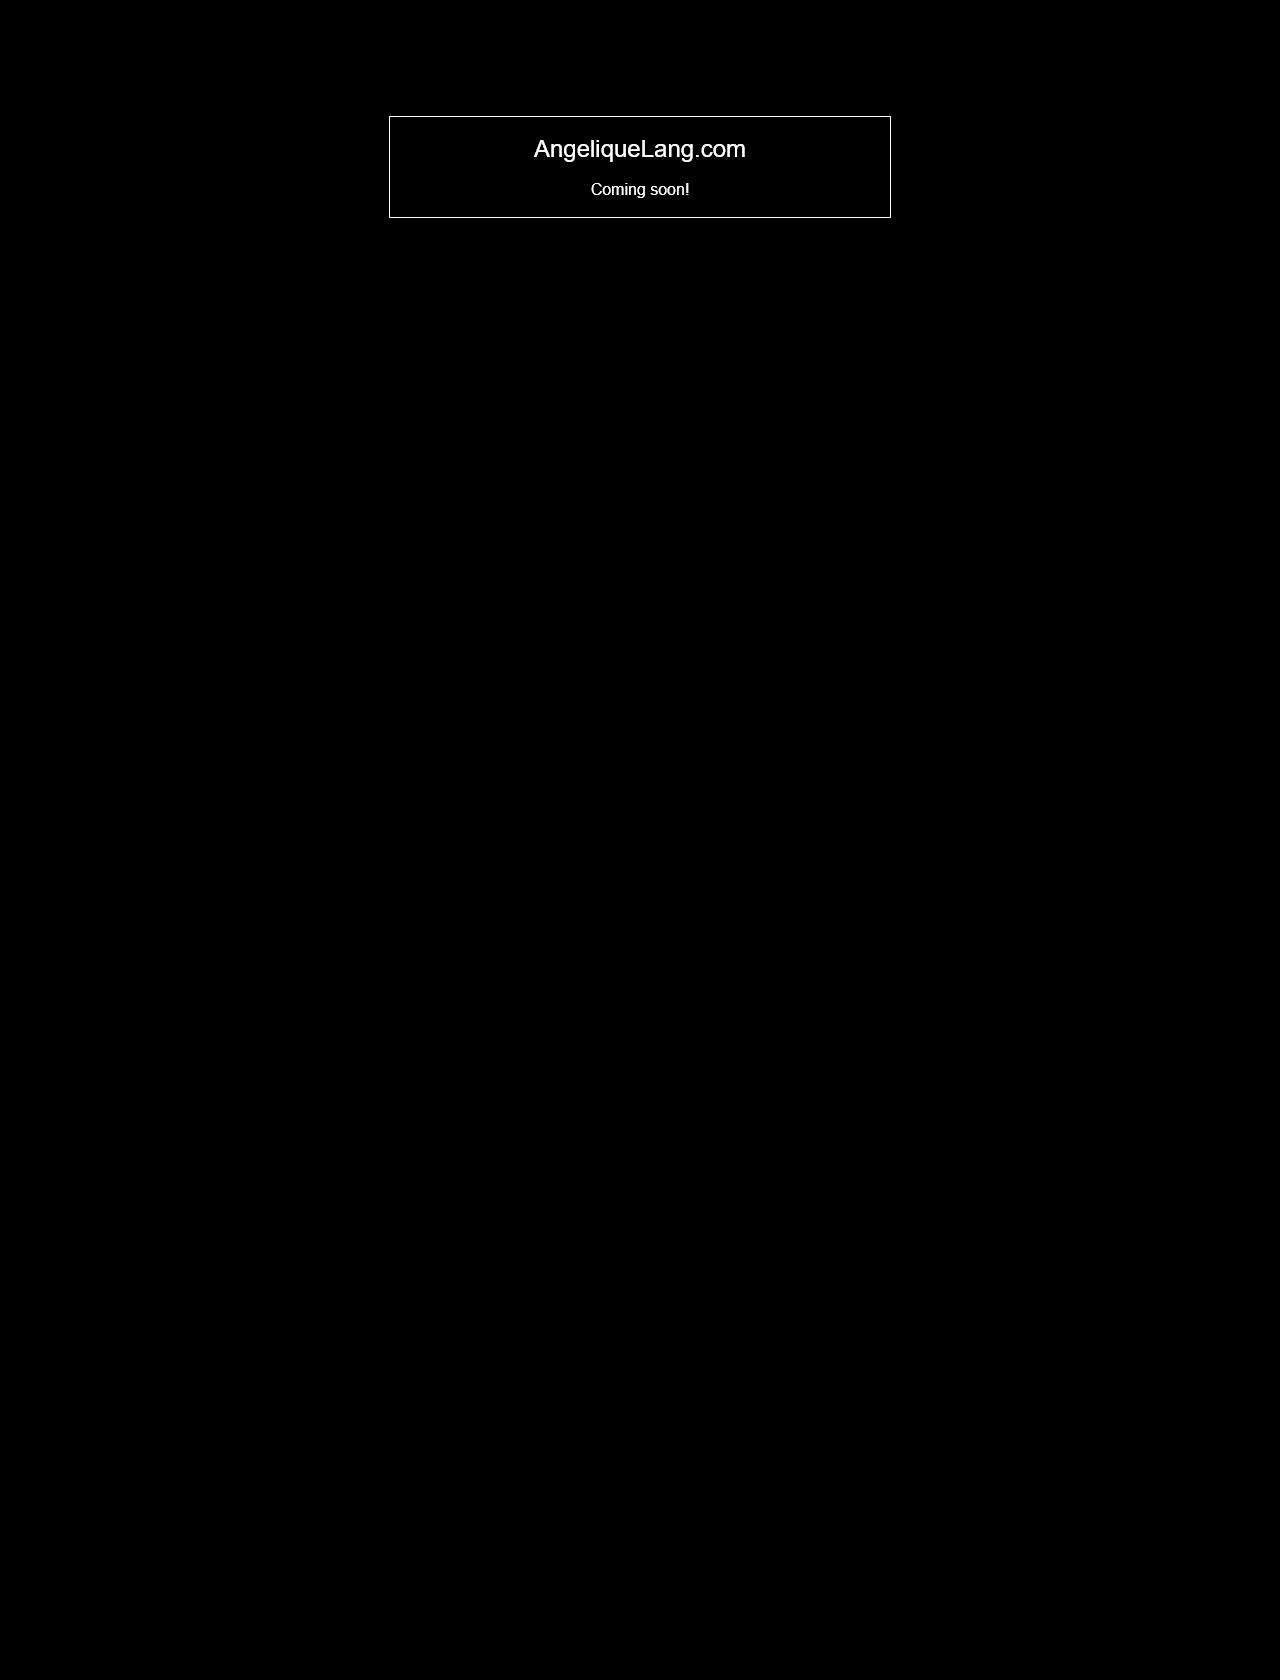 Screenshot Desktop - https://angeliquelang.com/